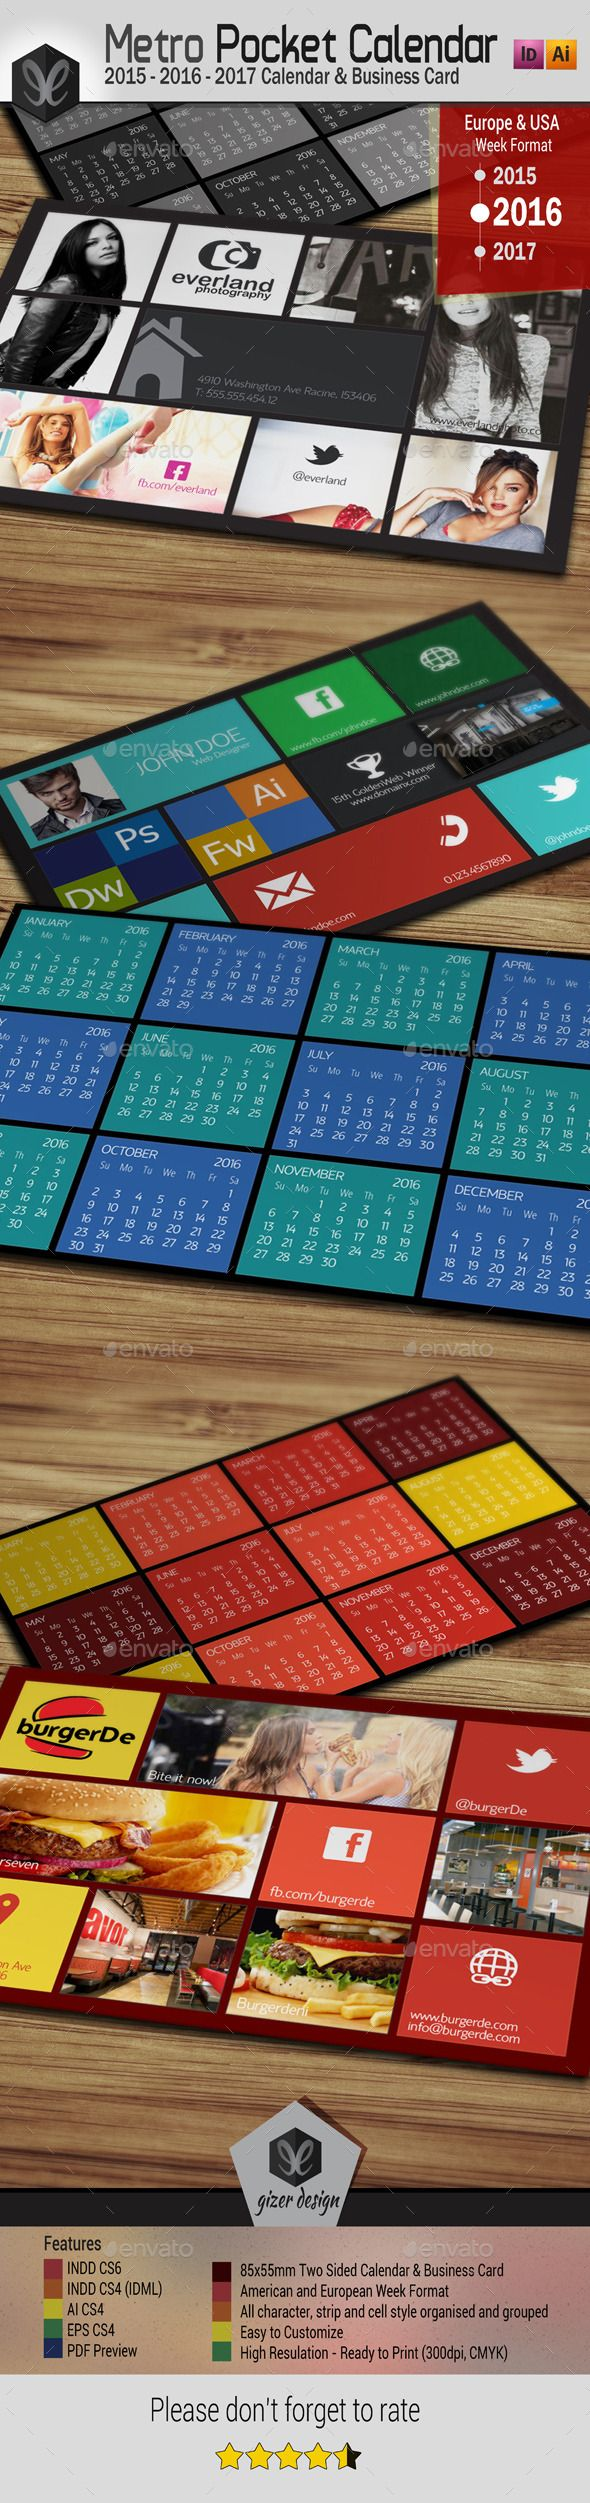 Pocket Calendar 2016 - 2015 - 2017 - Metro Style - Calendars Stationery